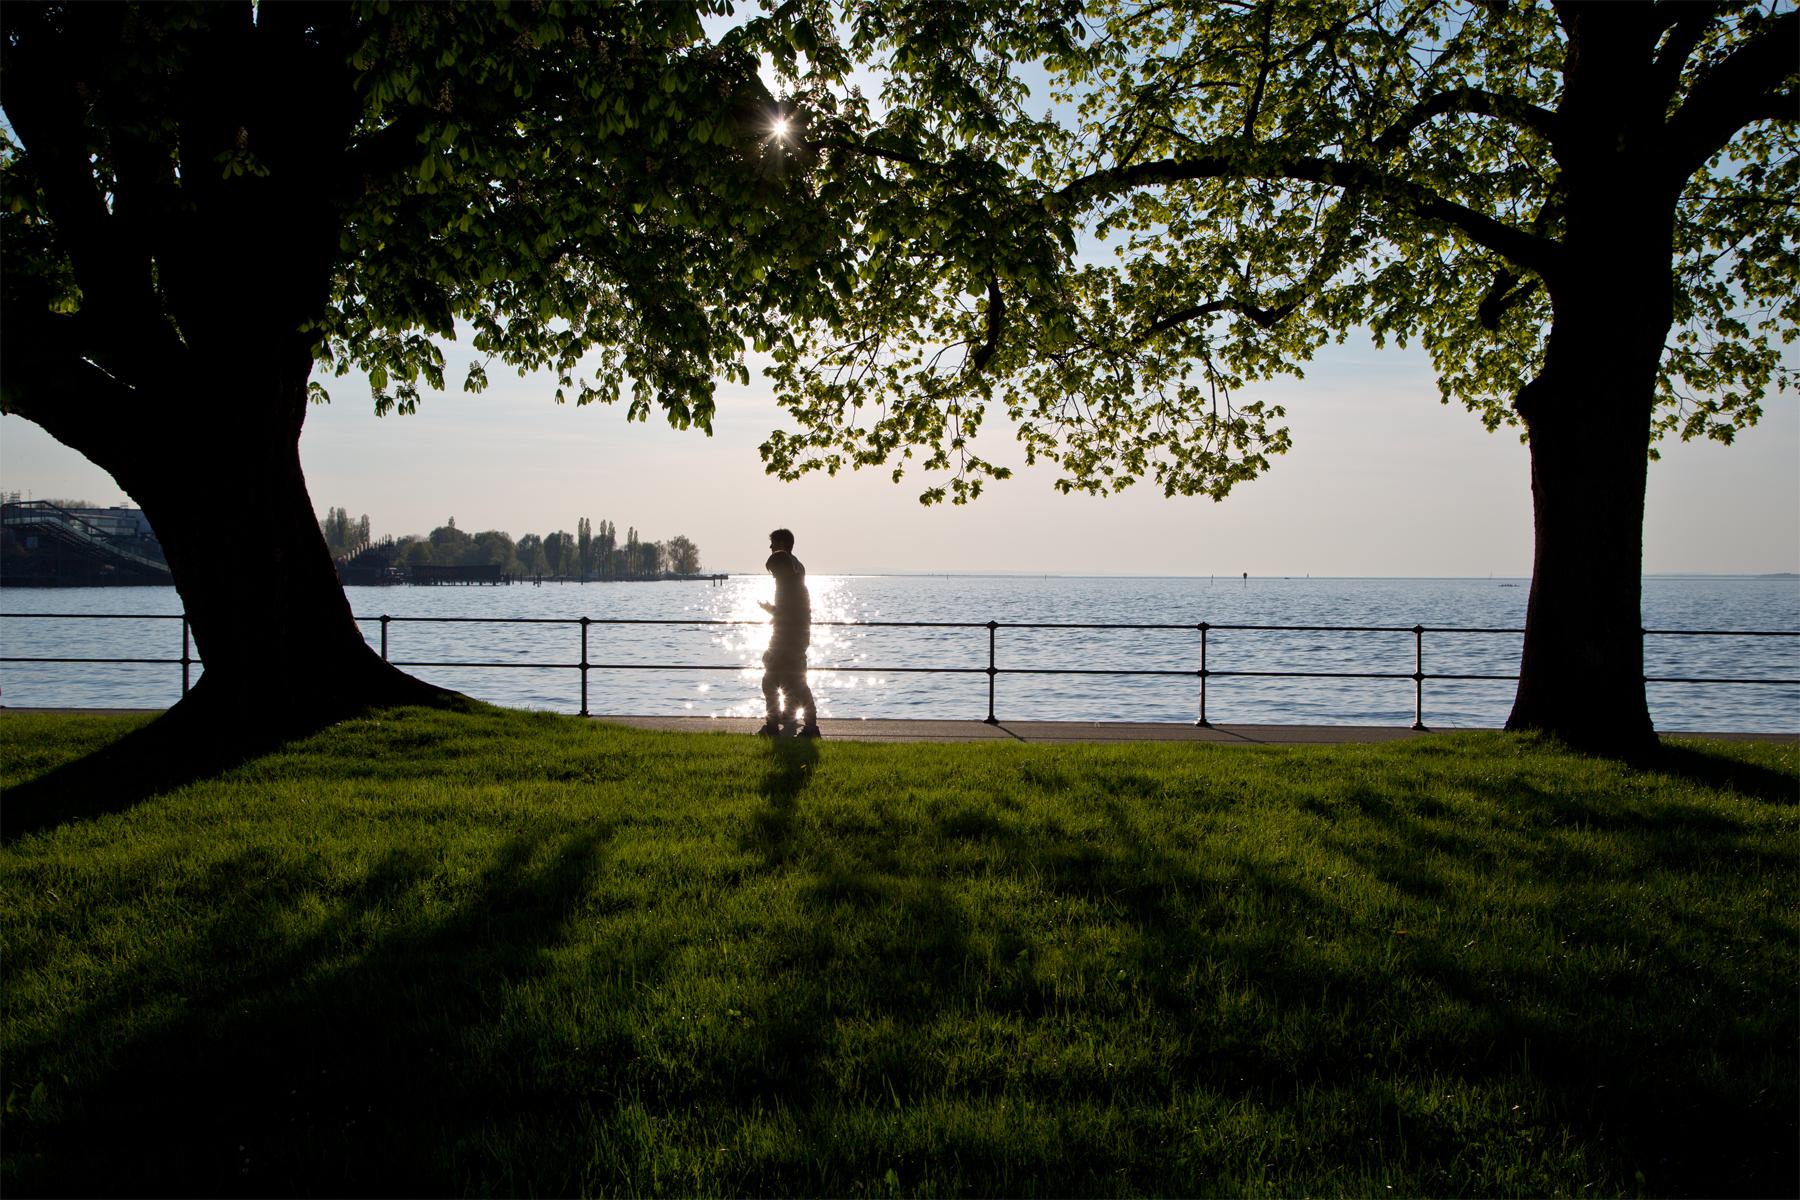 Bregenz-Bäume-Wasser-Bodensee-Spaziergänger-Lake Constance